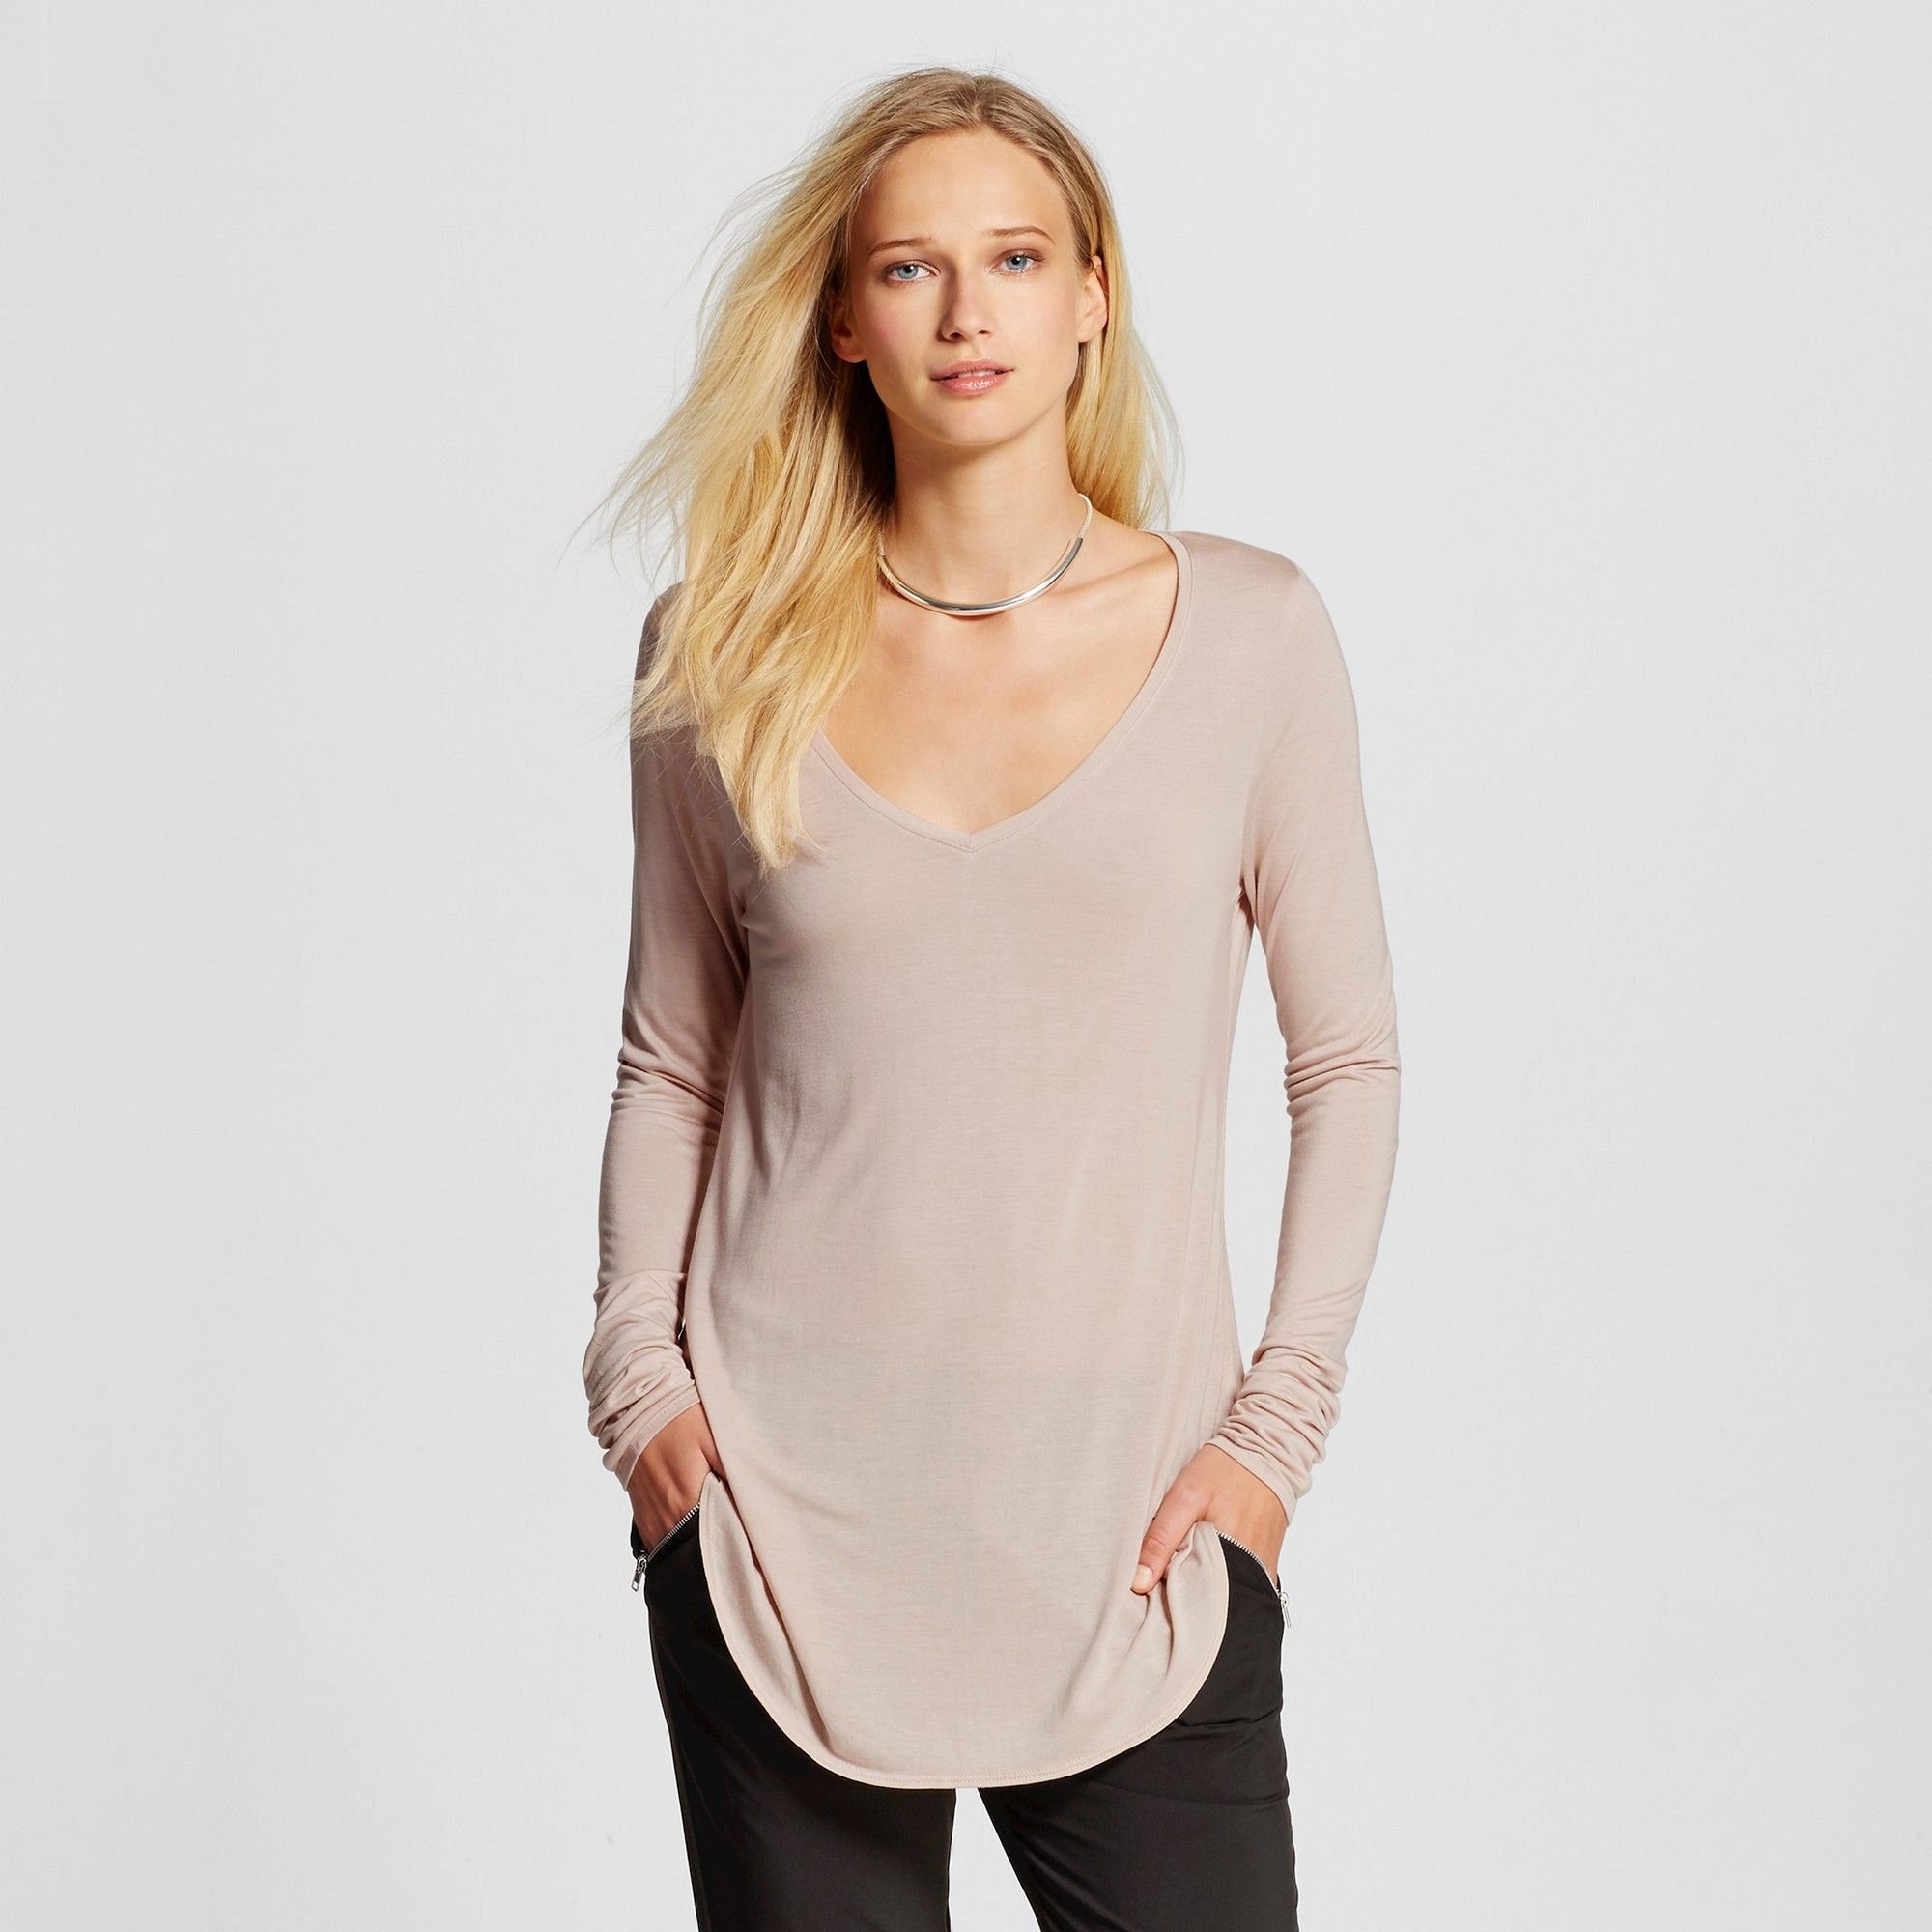 545274ec2 Women's Long Sleeve V-Neck T-Shirt Light Pink XL - Mossimo ...